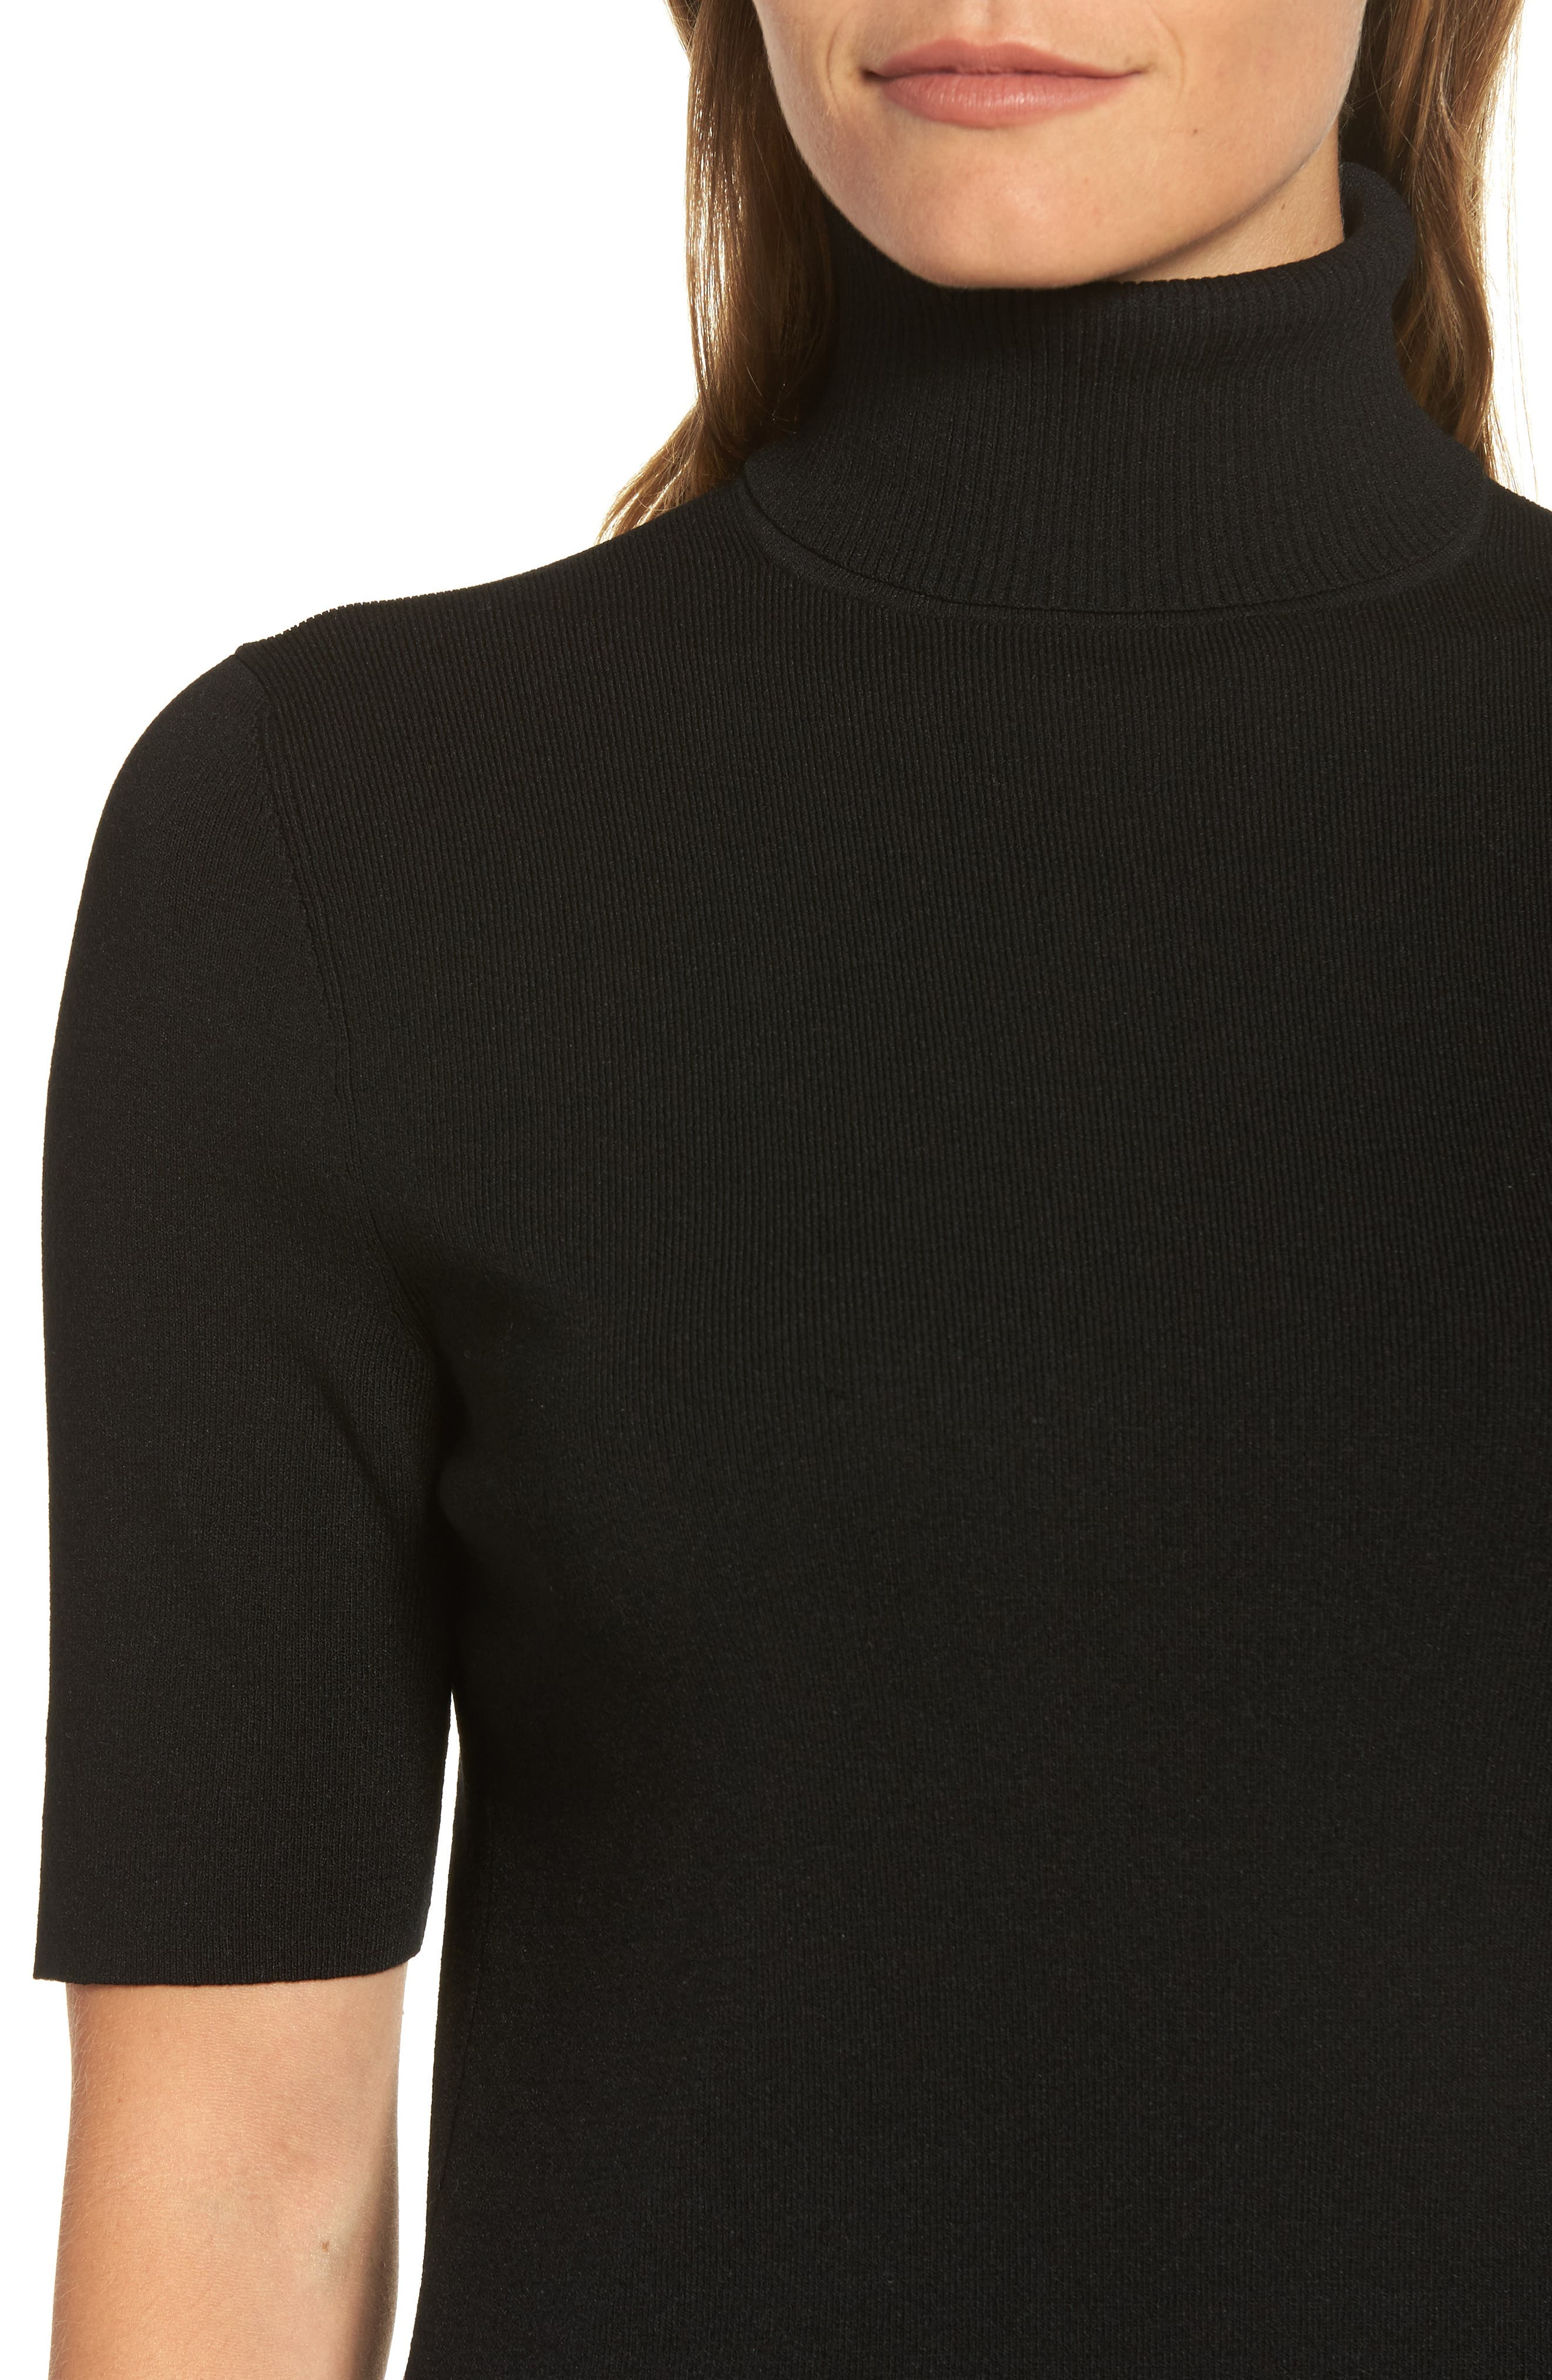 Turtleneck Sweater,                             Alternate thumbnail 4, color,                             002